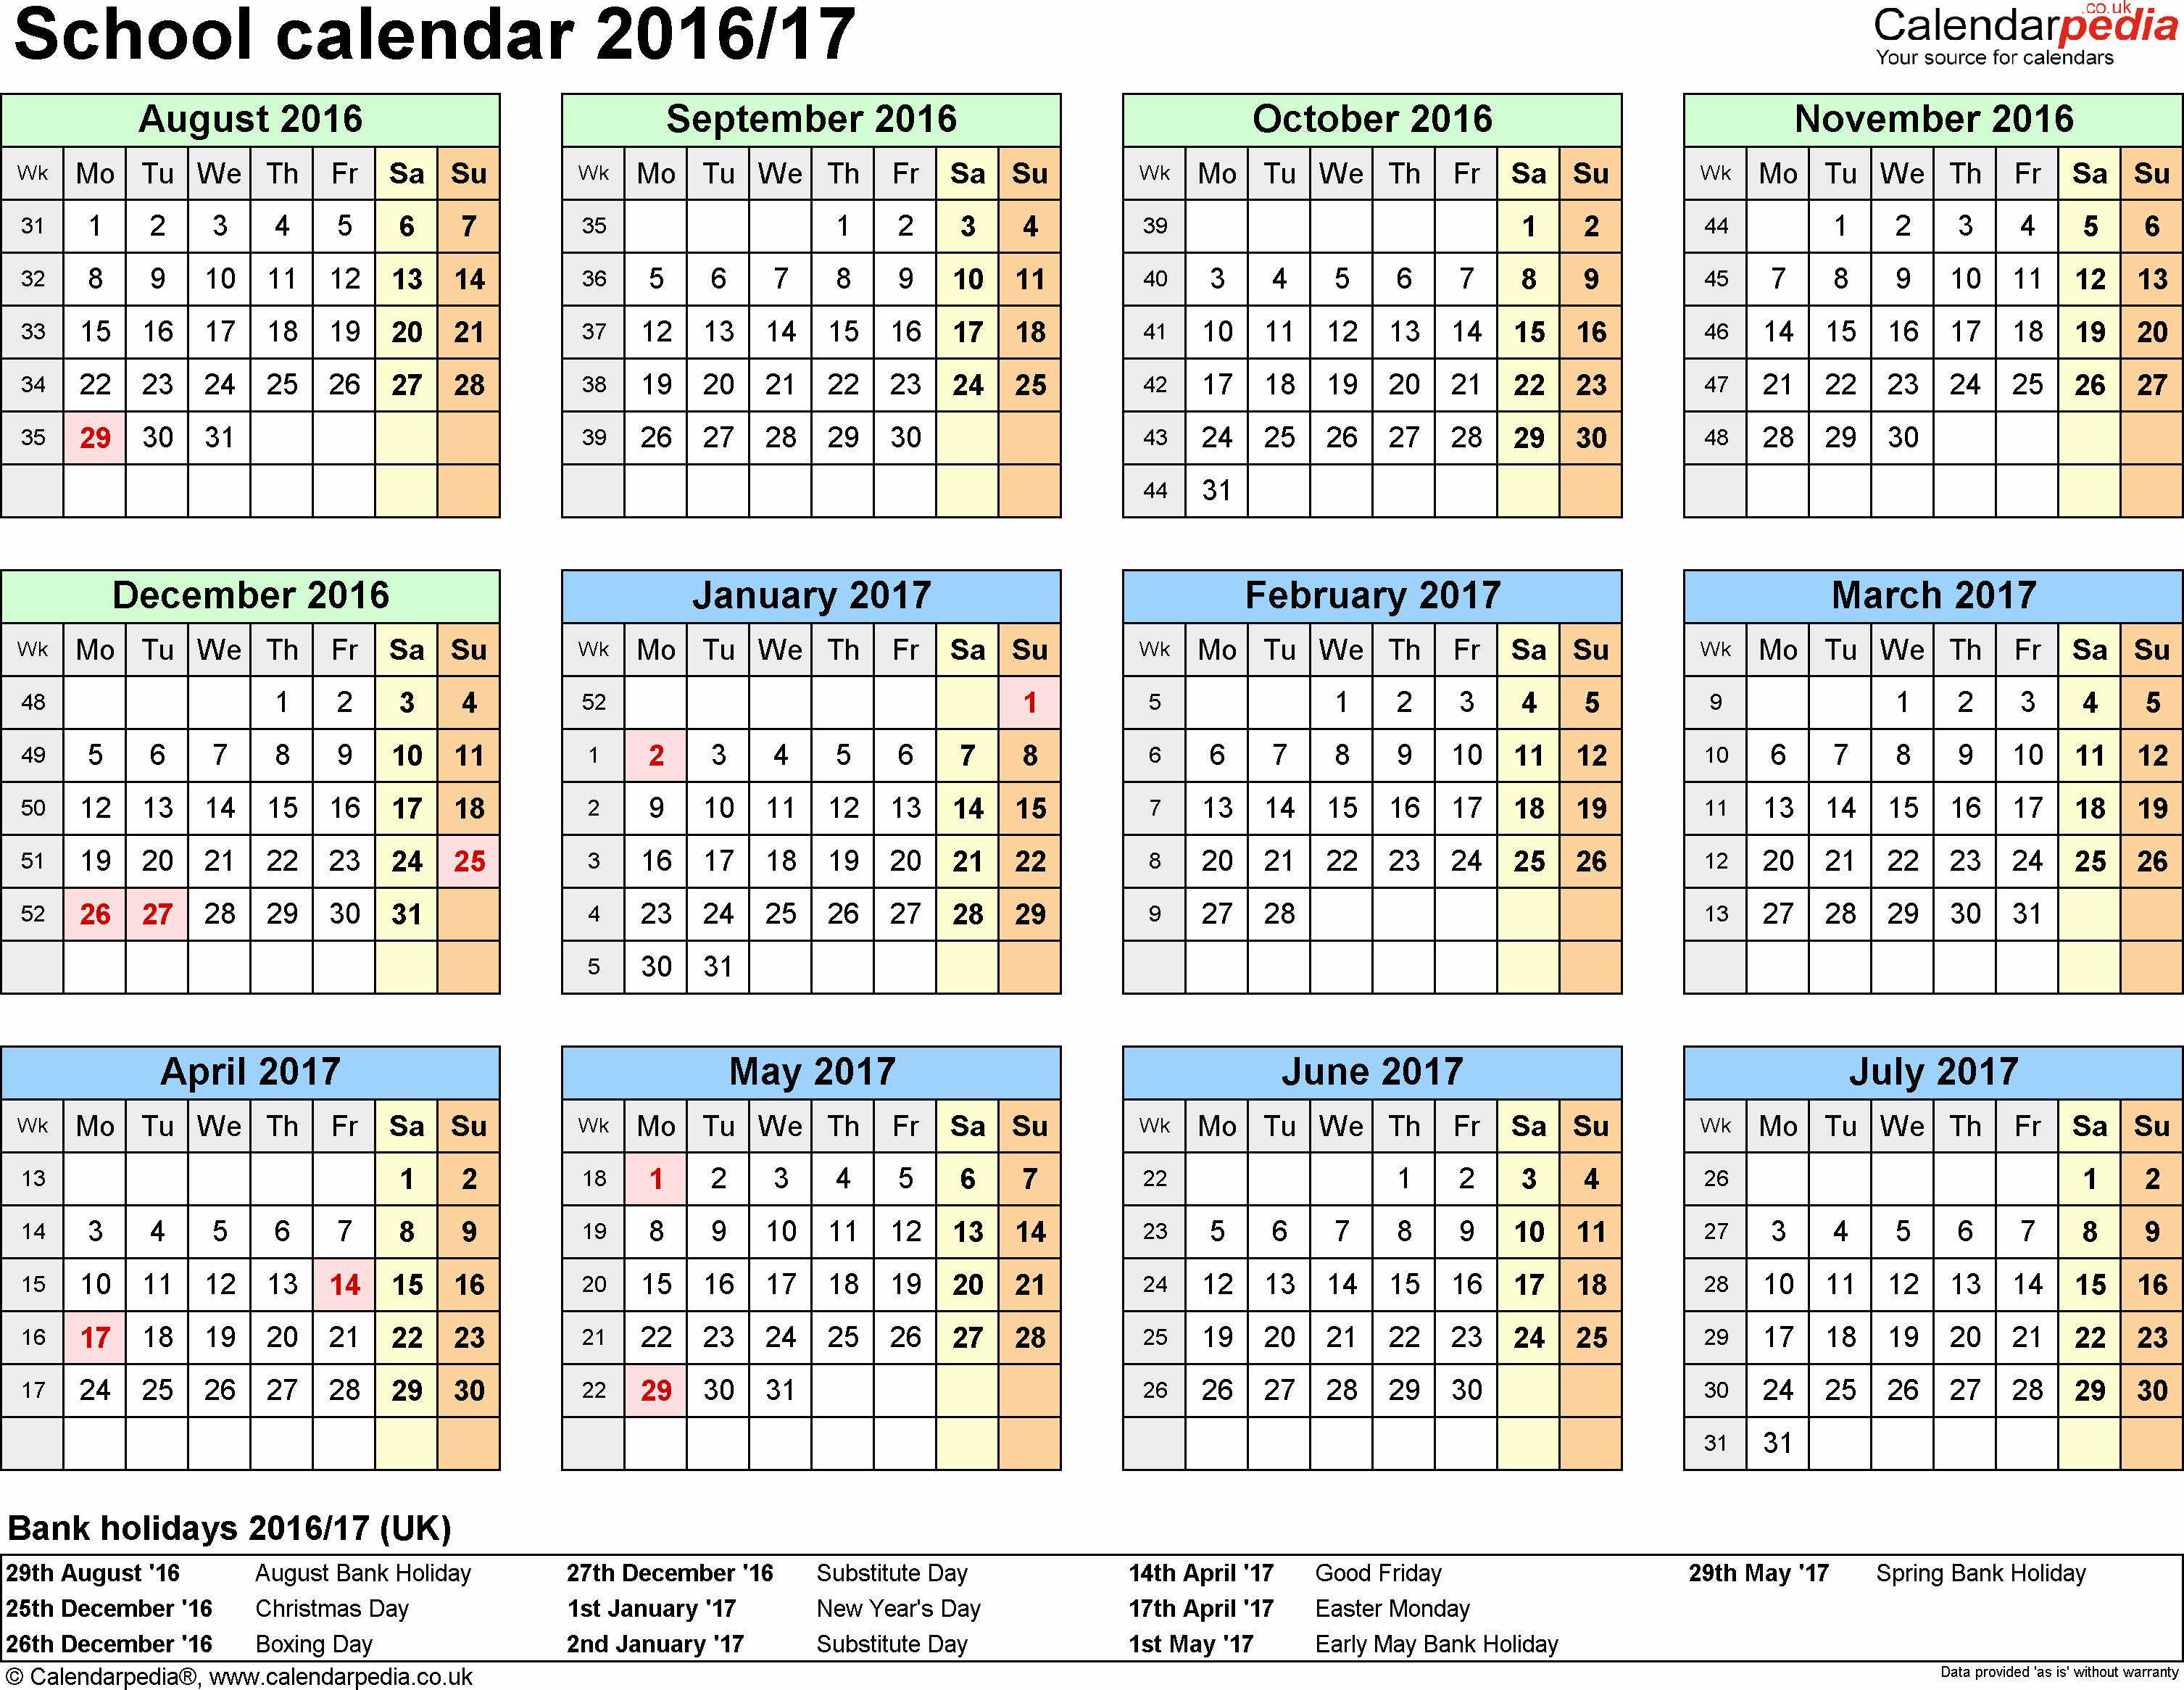 2016 2017 School Calendar Template New School Calendars 2016 2017 as Free Printable Word Templates